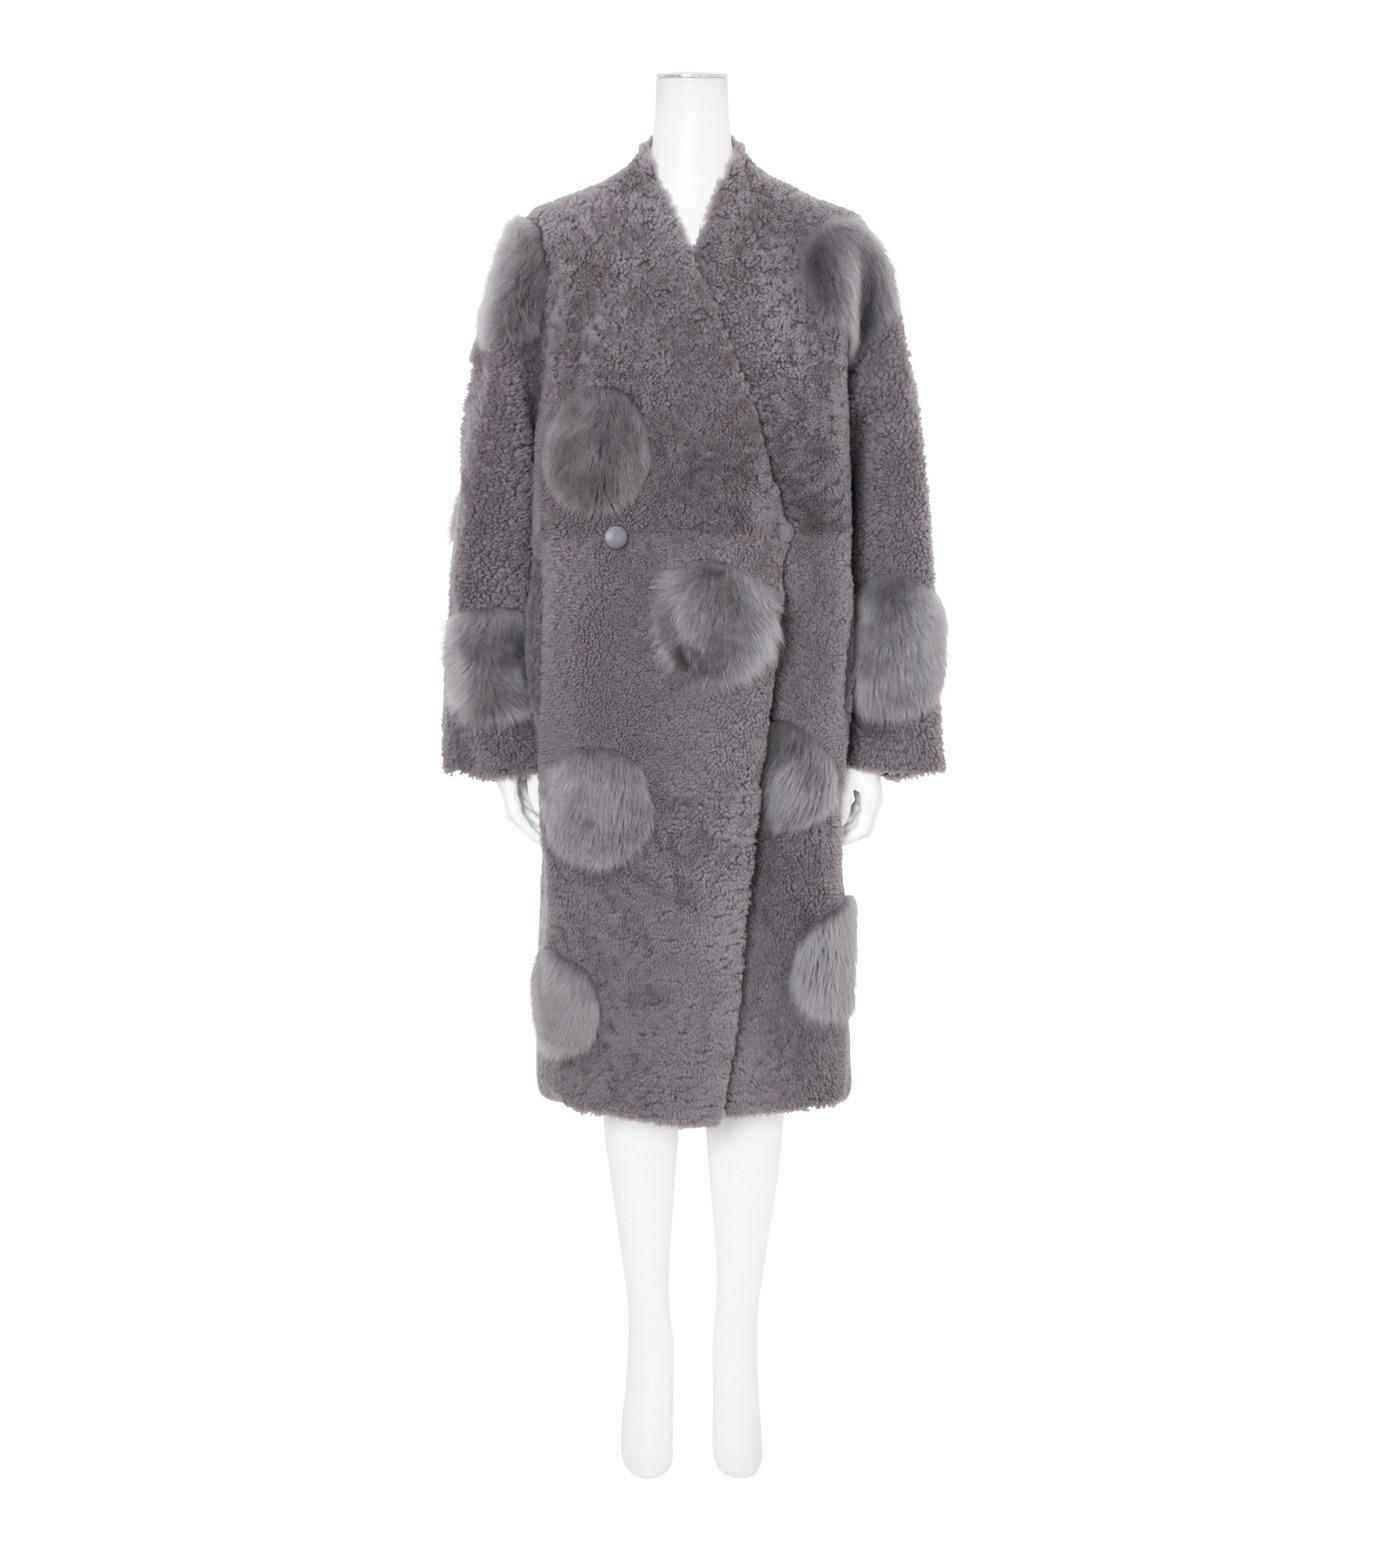 ANNE VEST(アンベスト)のLayla Coat w/Dots Reversible-GRAY-AW160121005-11 拡大詳細画像1